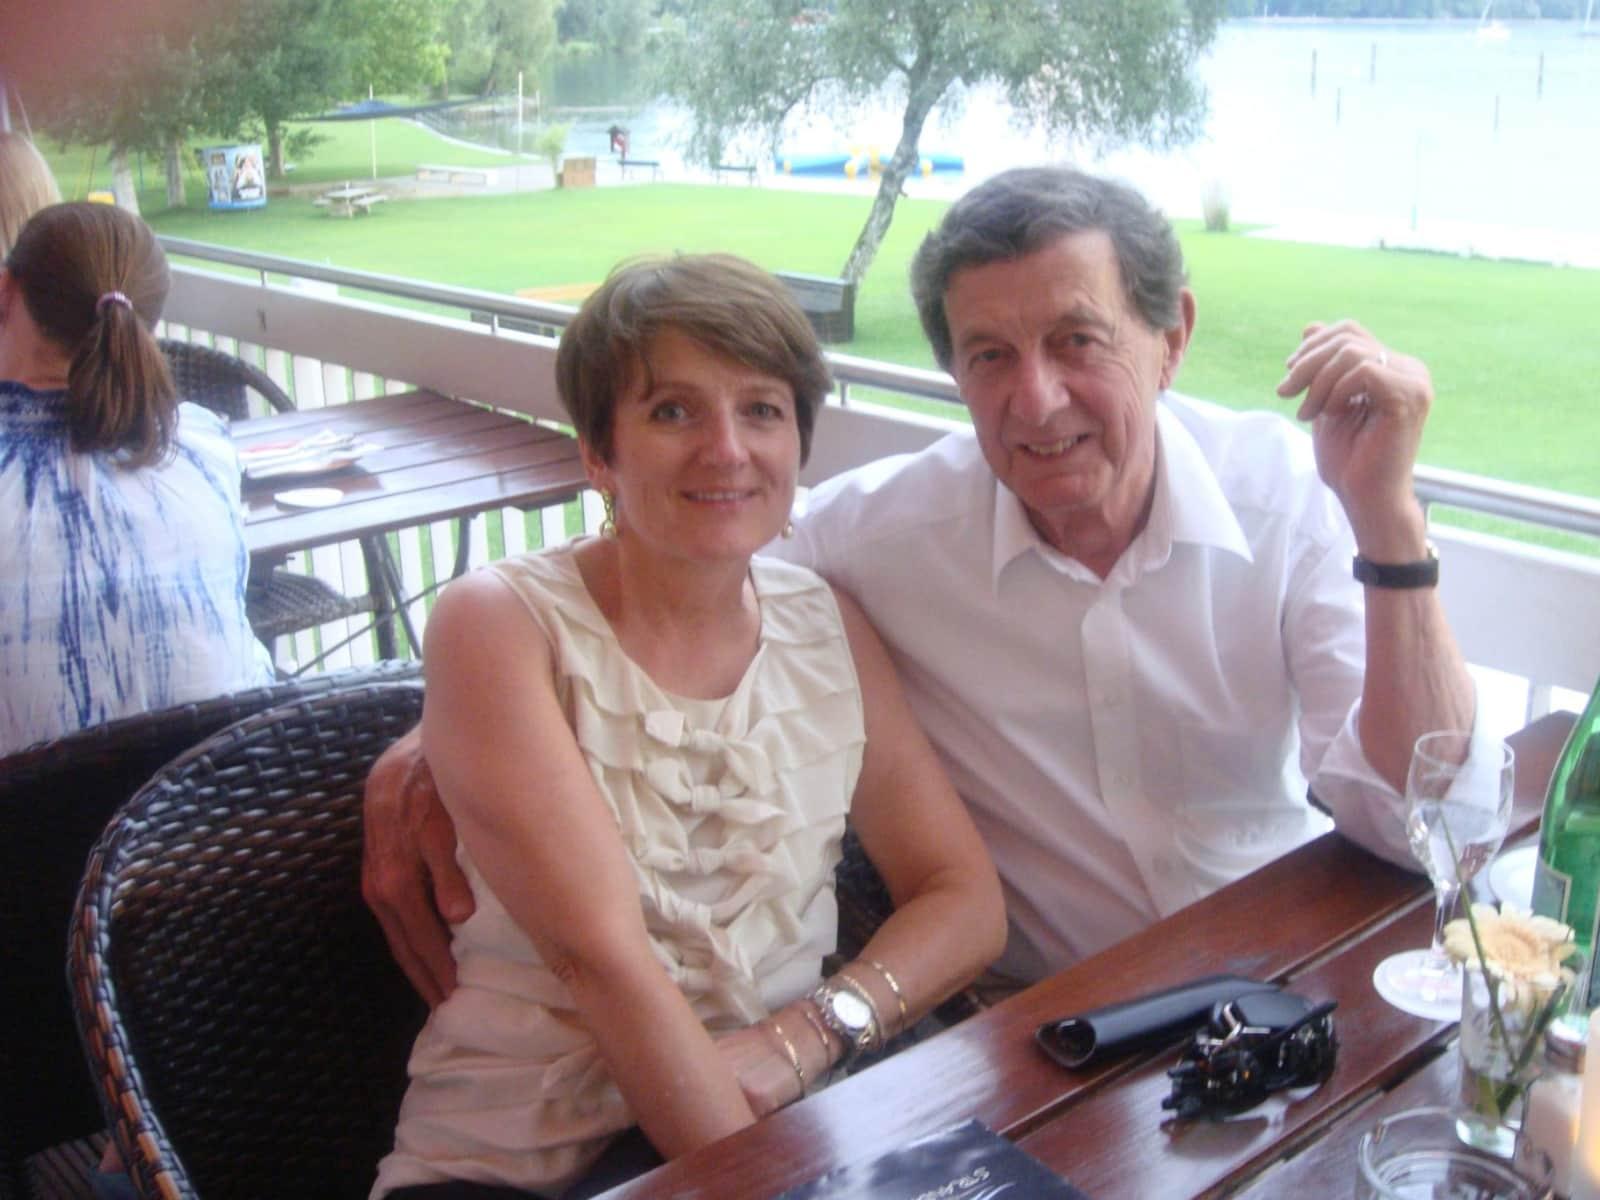 Barbara & Edward from Munich, Germany